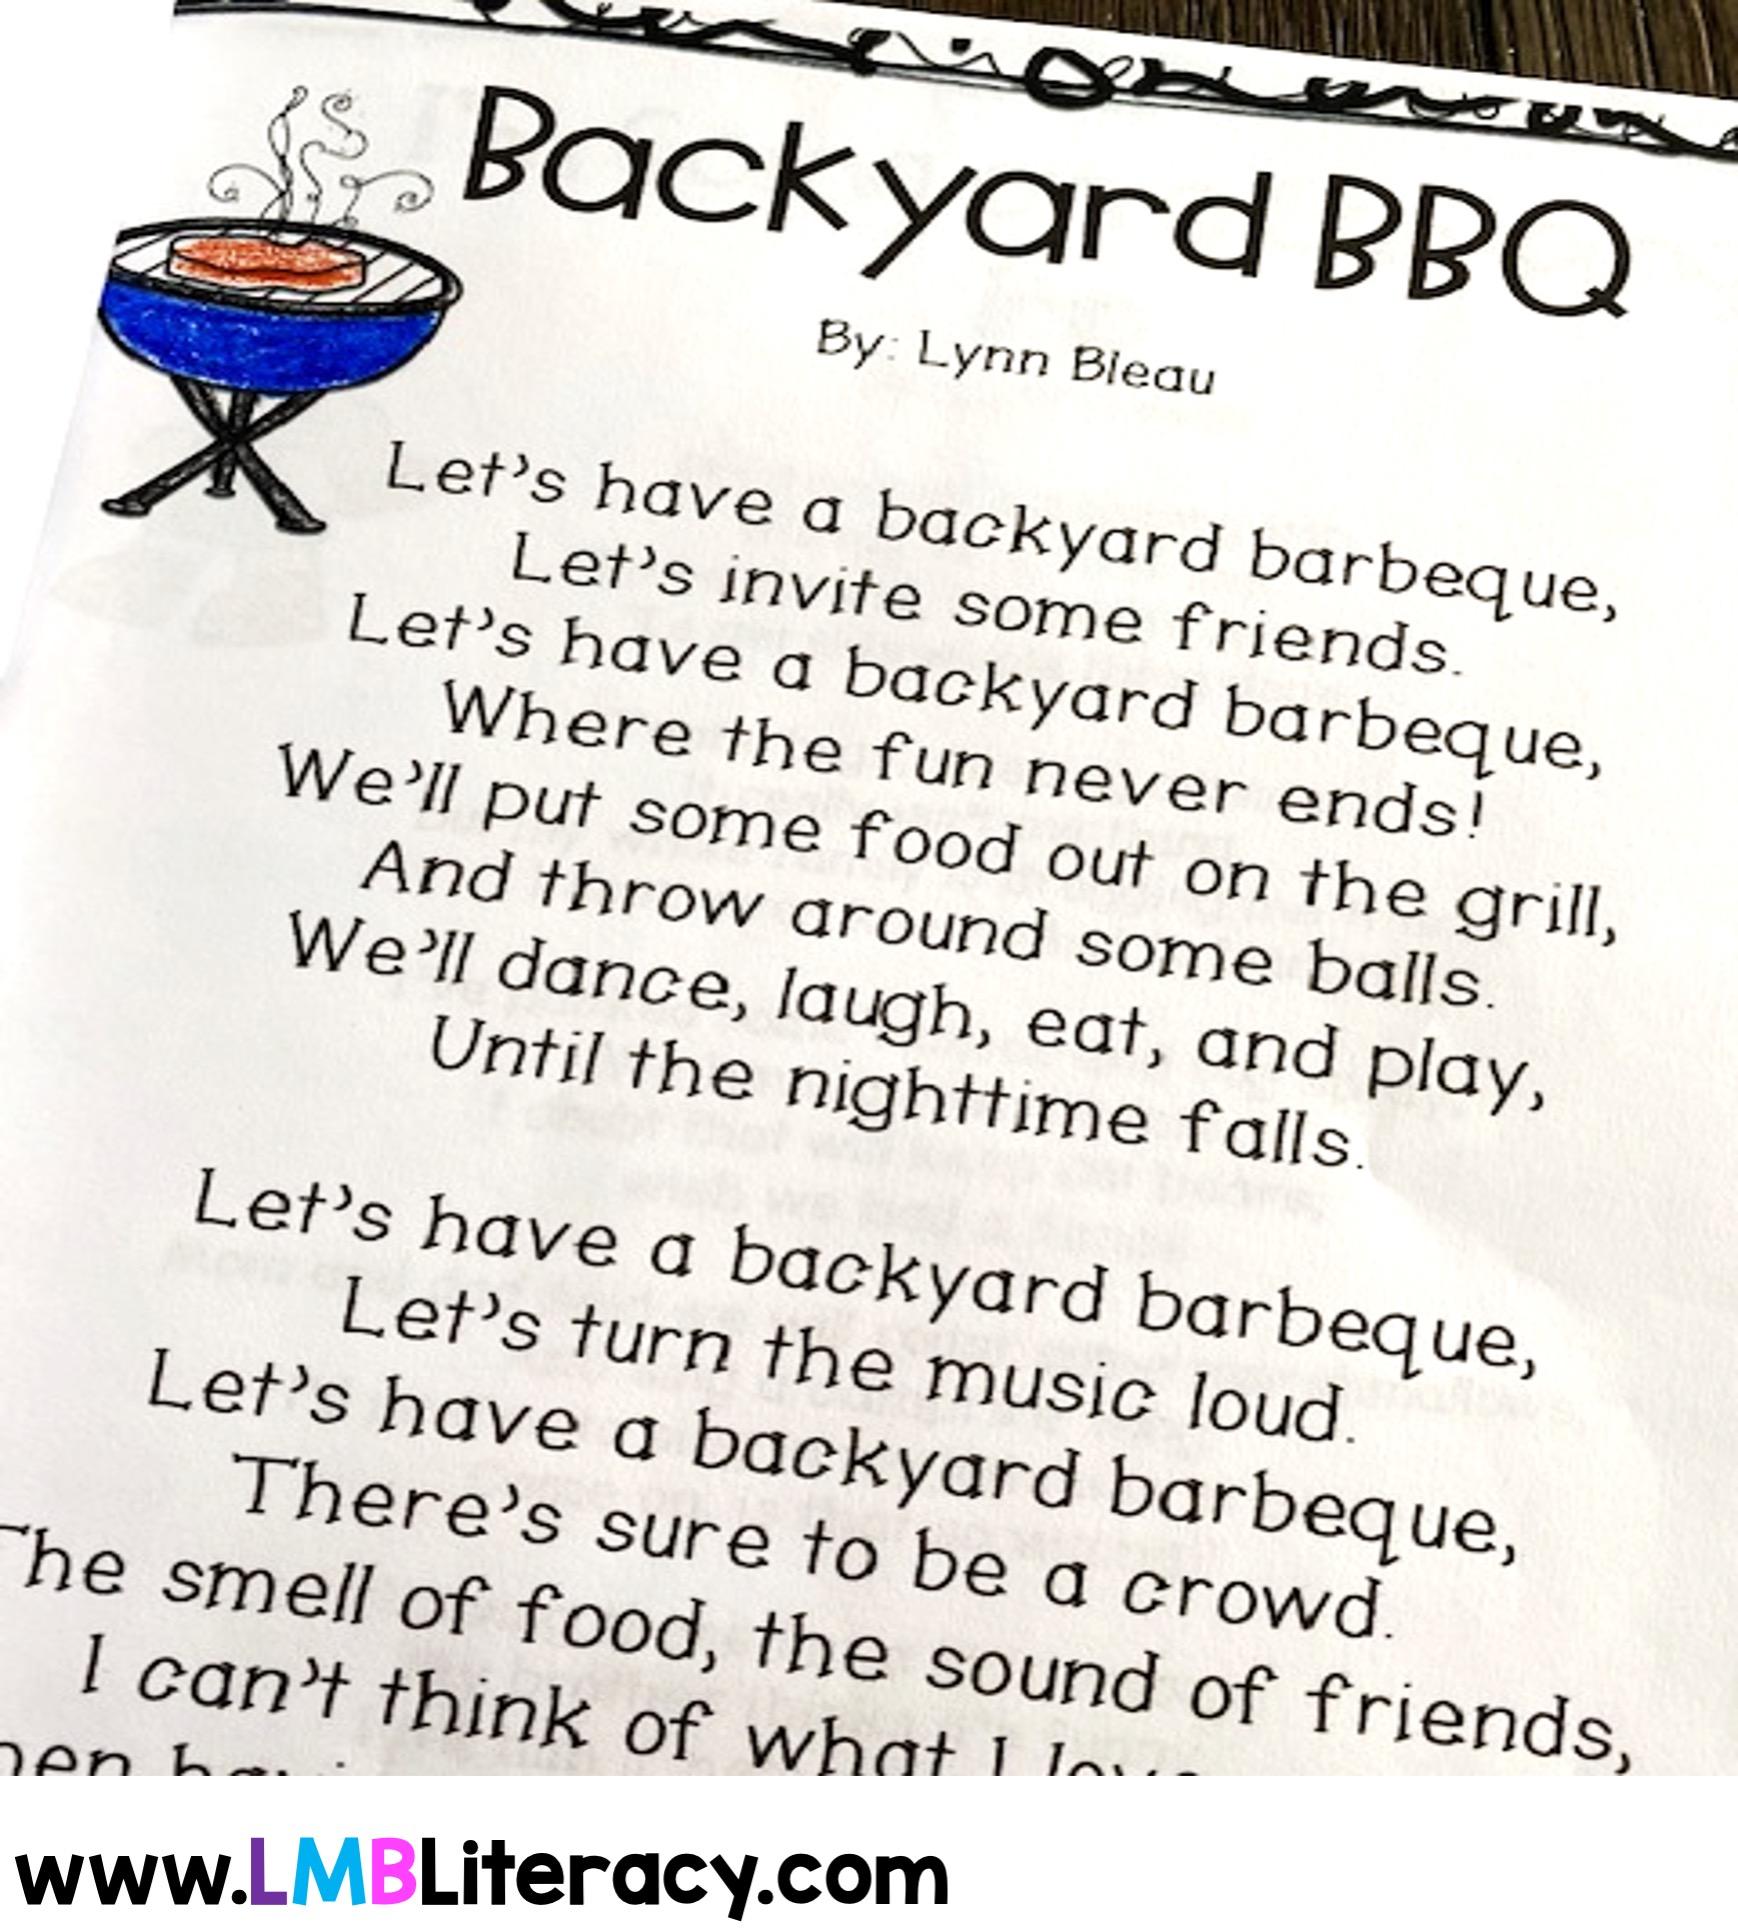 Backyard bbq example poem